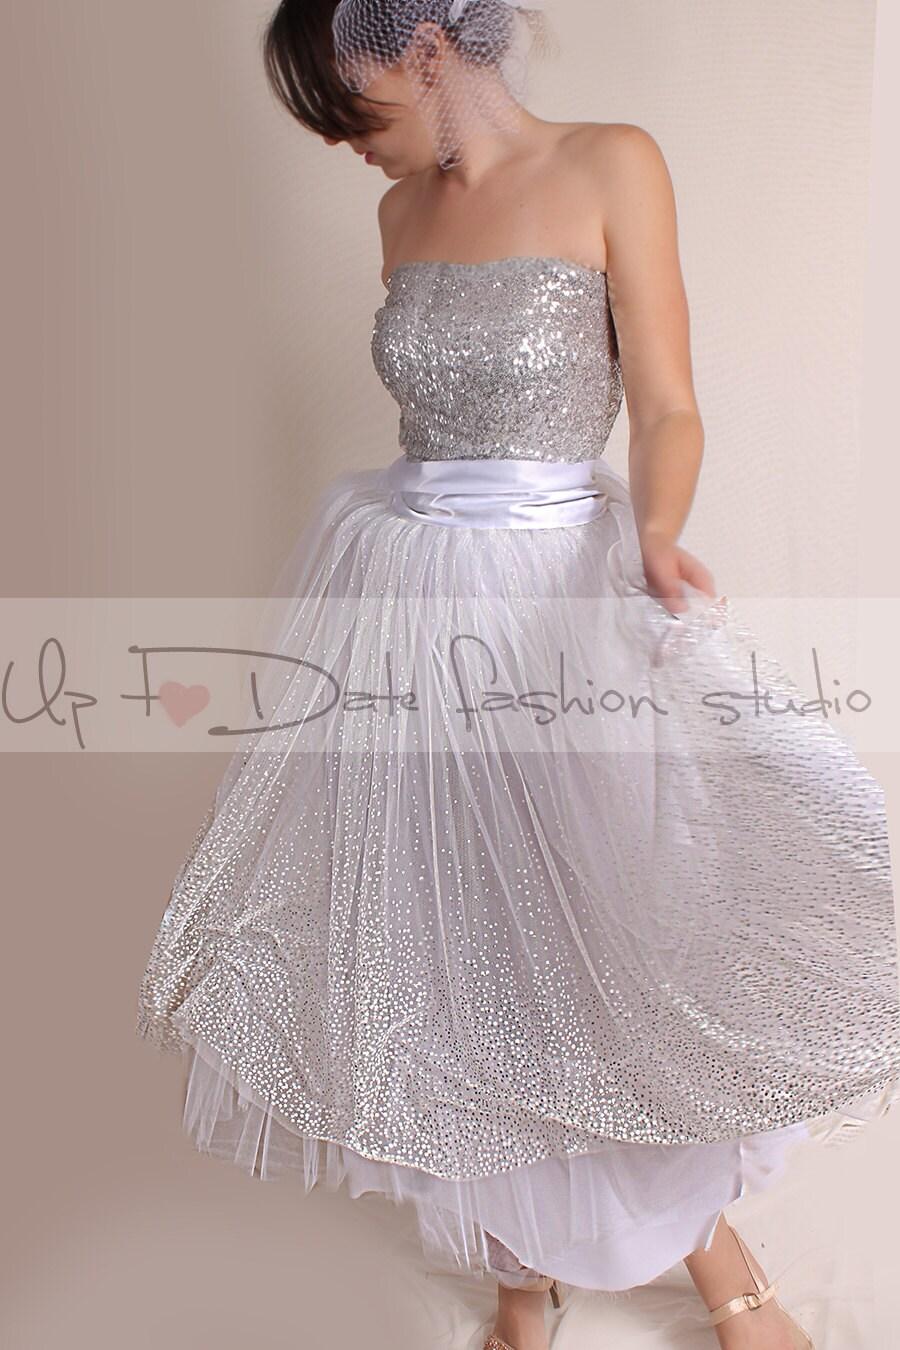 Vintage inspired wedding dress 50s style tutu tulle tea for 50s inspired wedding dress